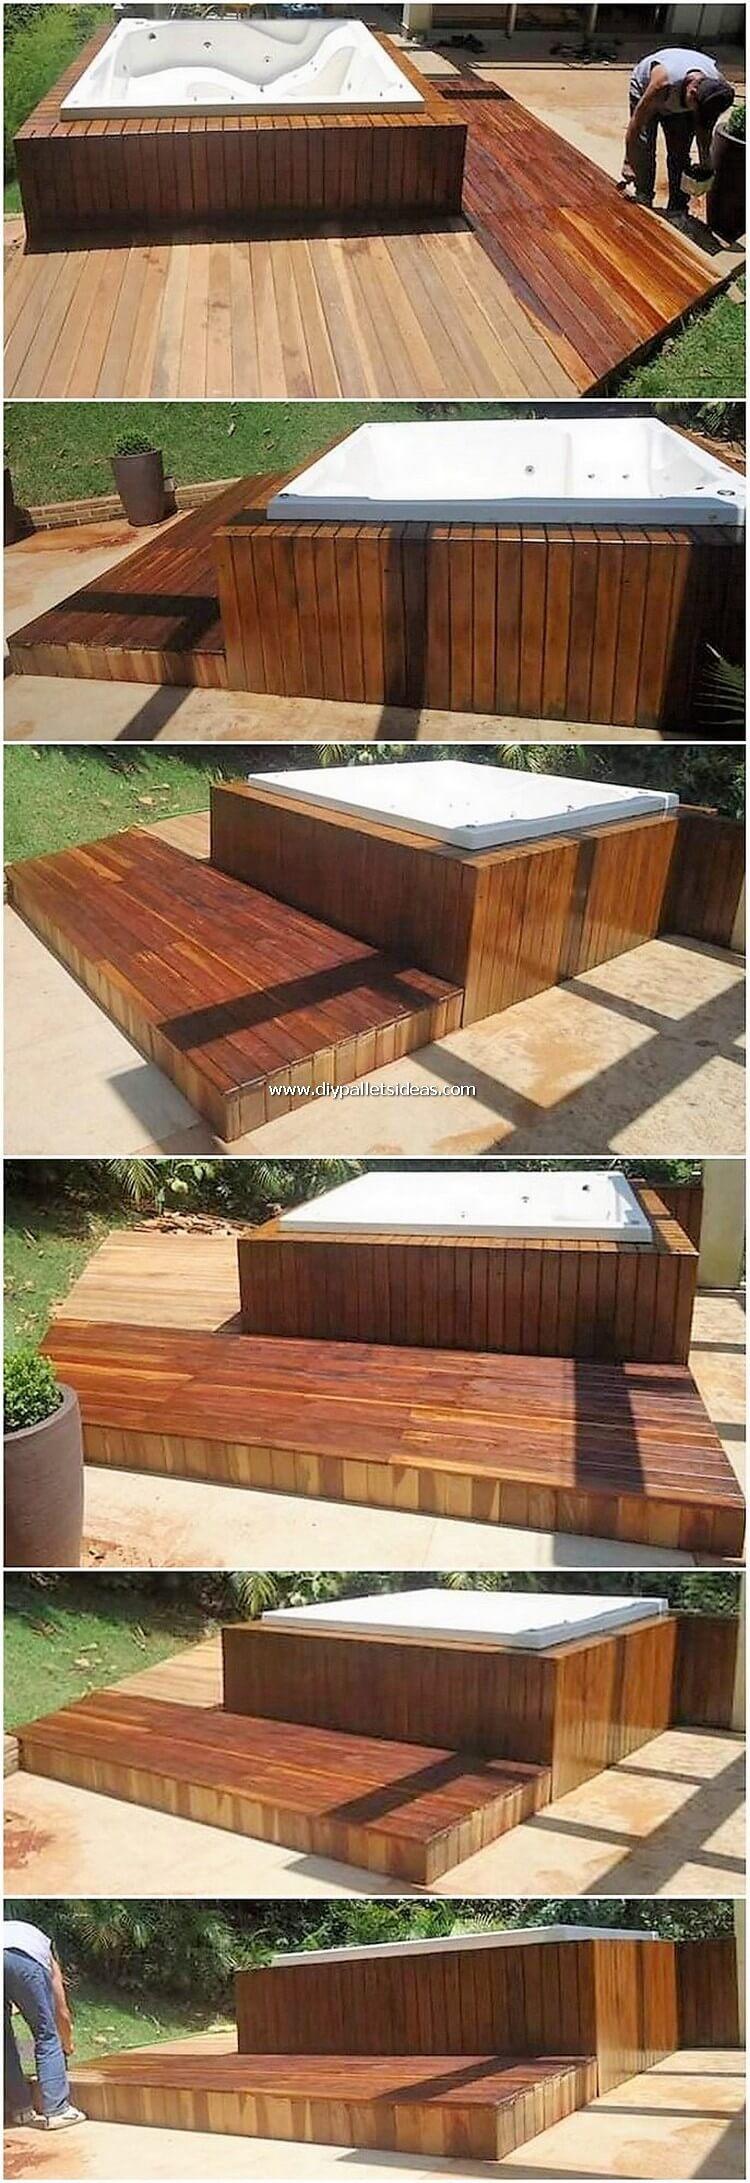 Pallet Swimming Pool Deck